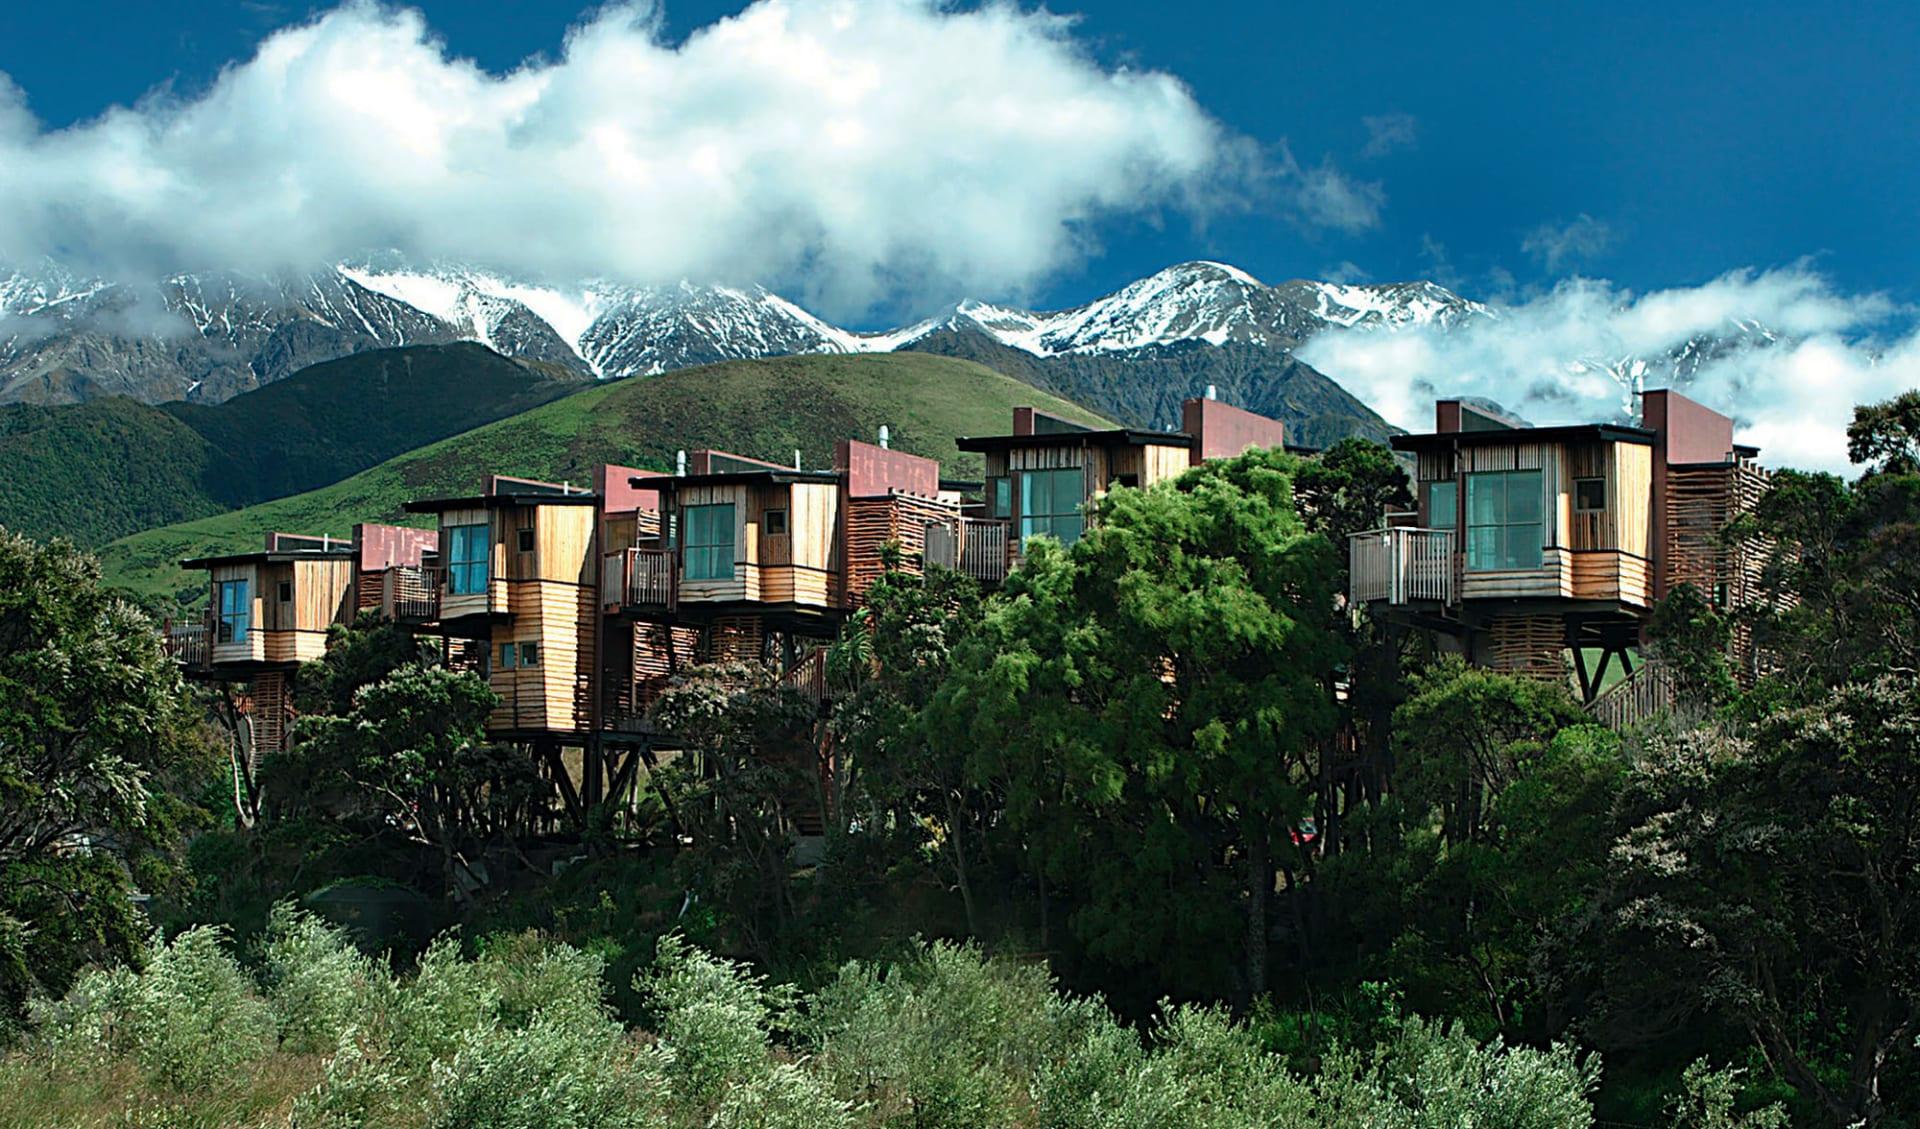 Hapuku Lodge in Kaikoura:  Hapuku Lodge - Blick auf gesamte Anlage